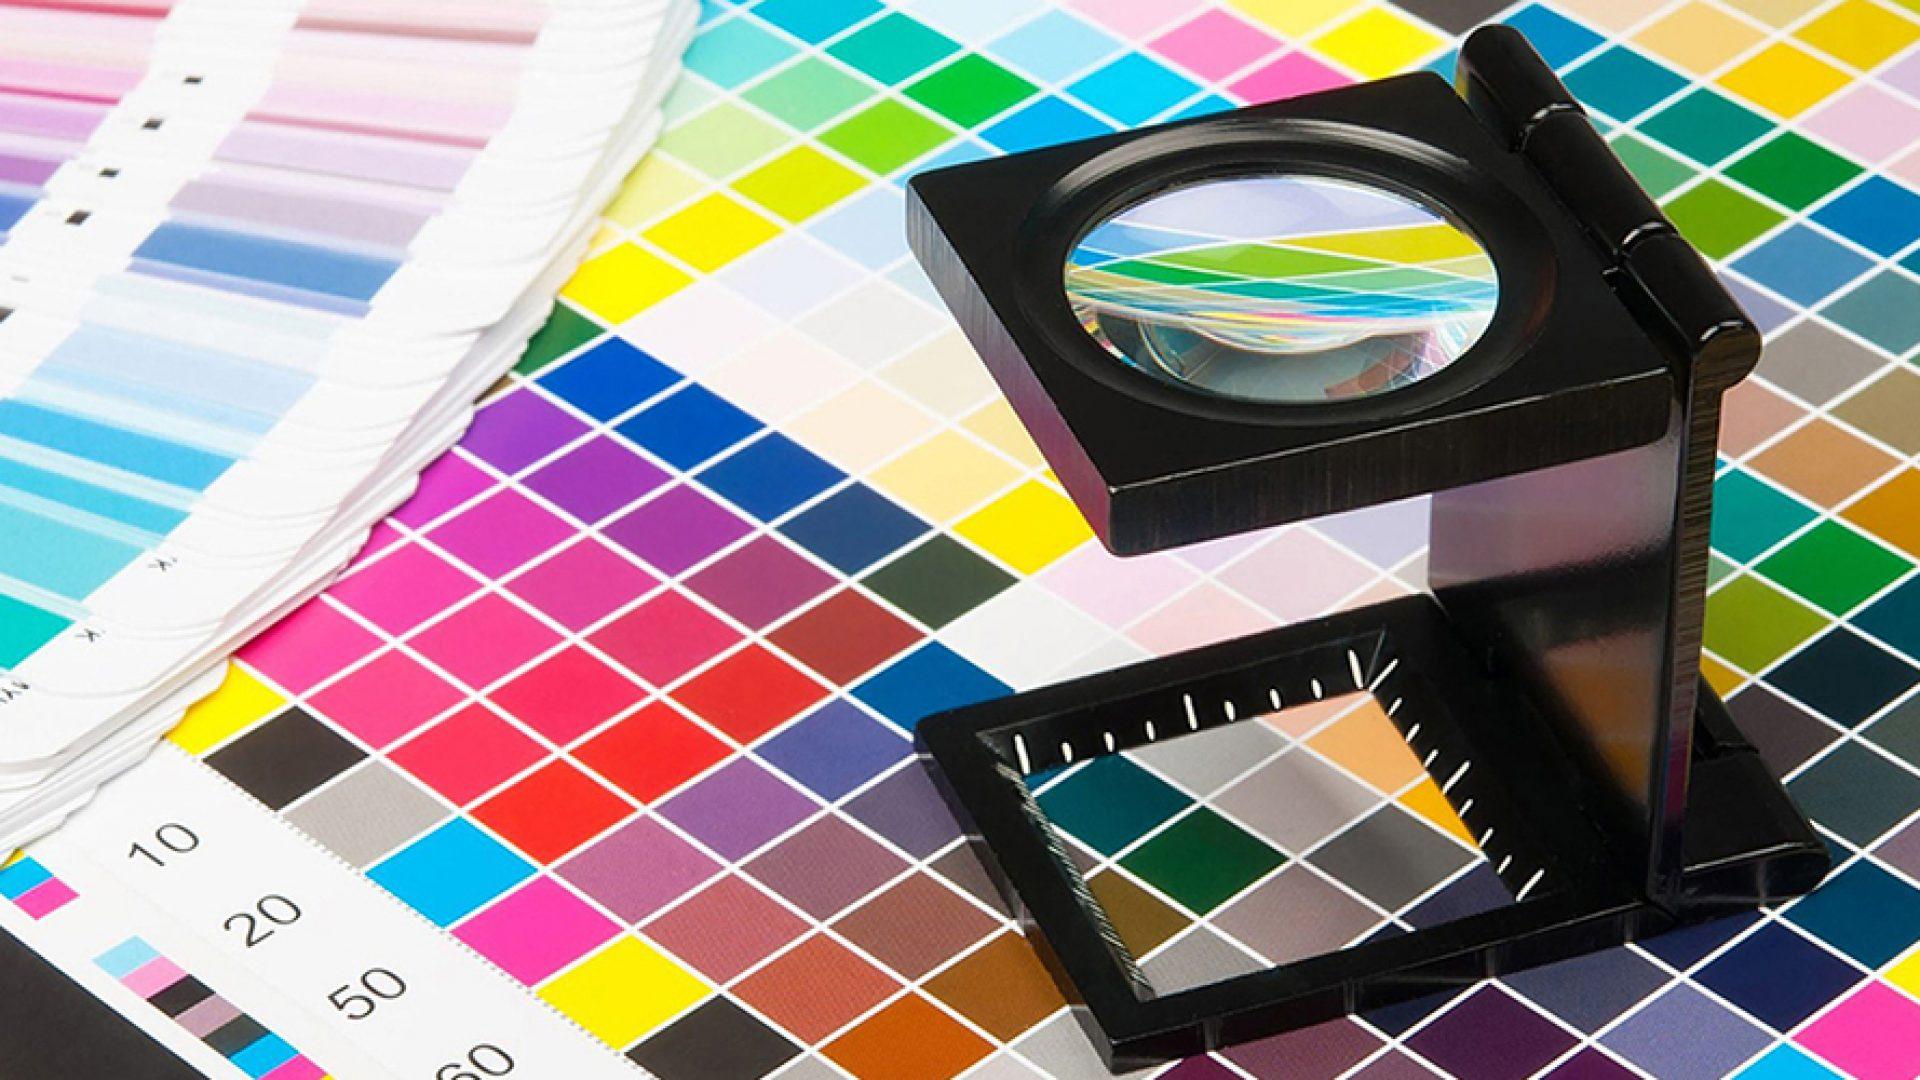 offset printing color matching printability 1920x1080 - Giới thiệu